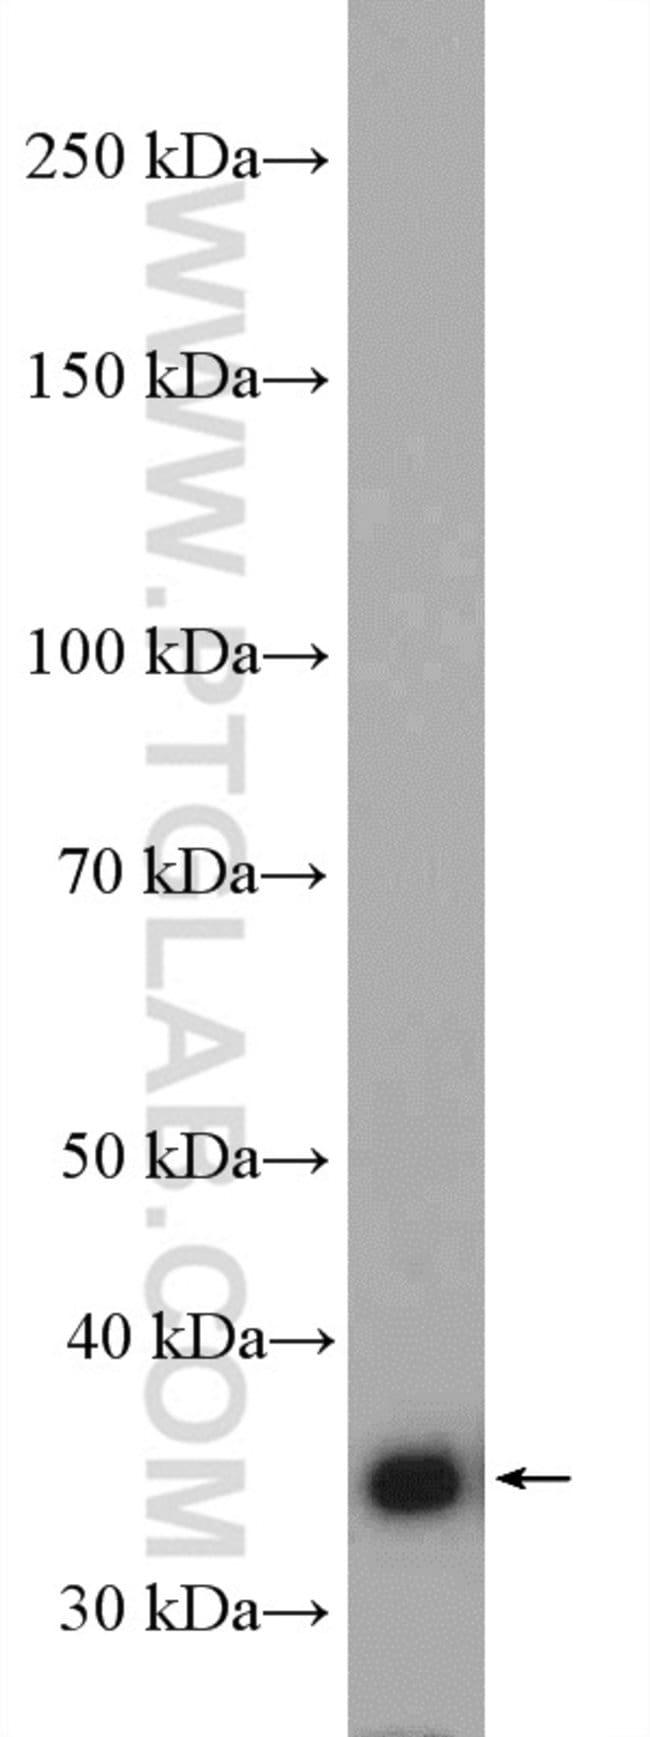 JAB1 Rabbit anti-Human, Polyclonal, Proteintech: Page d'accueil